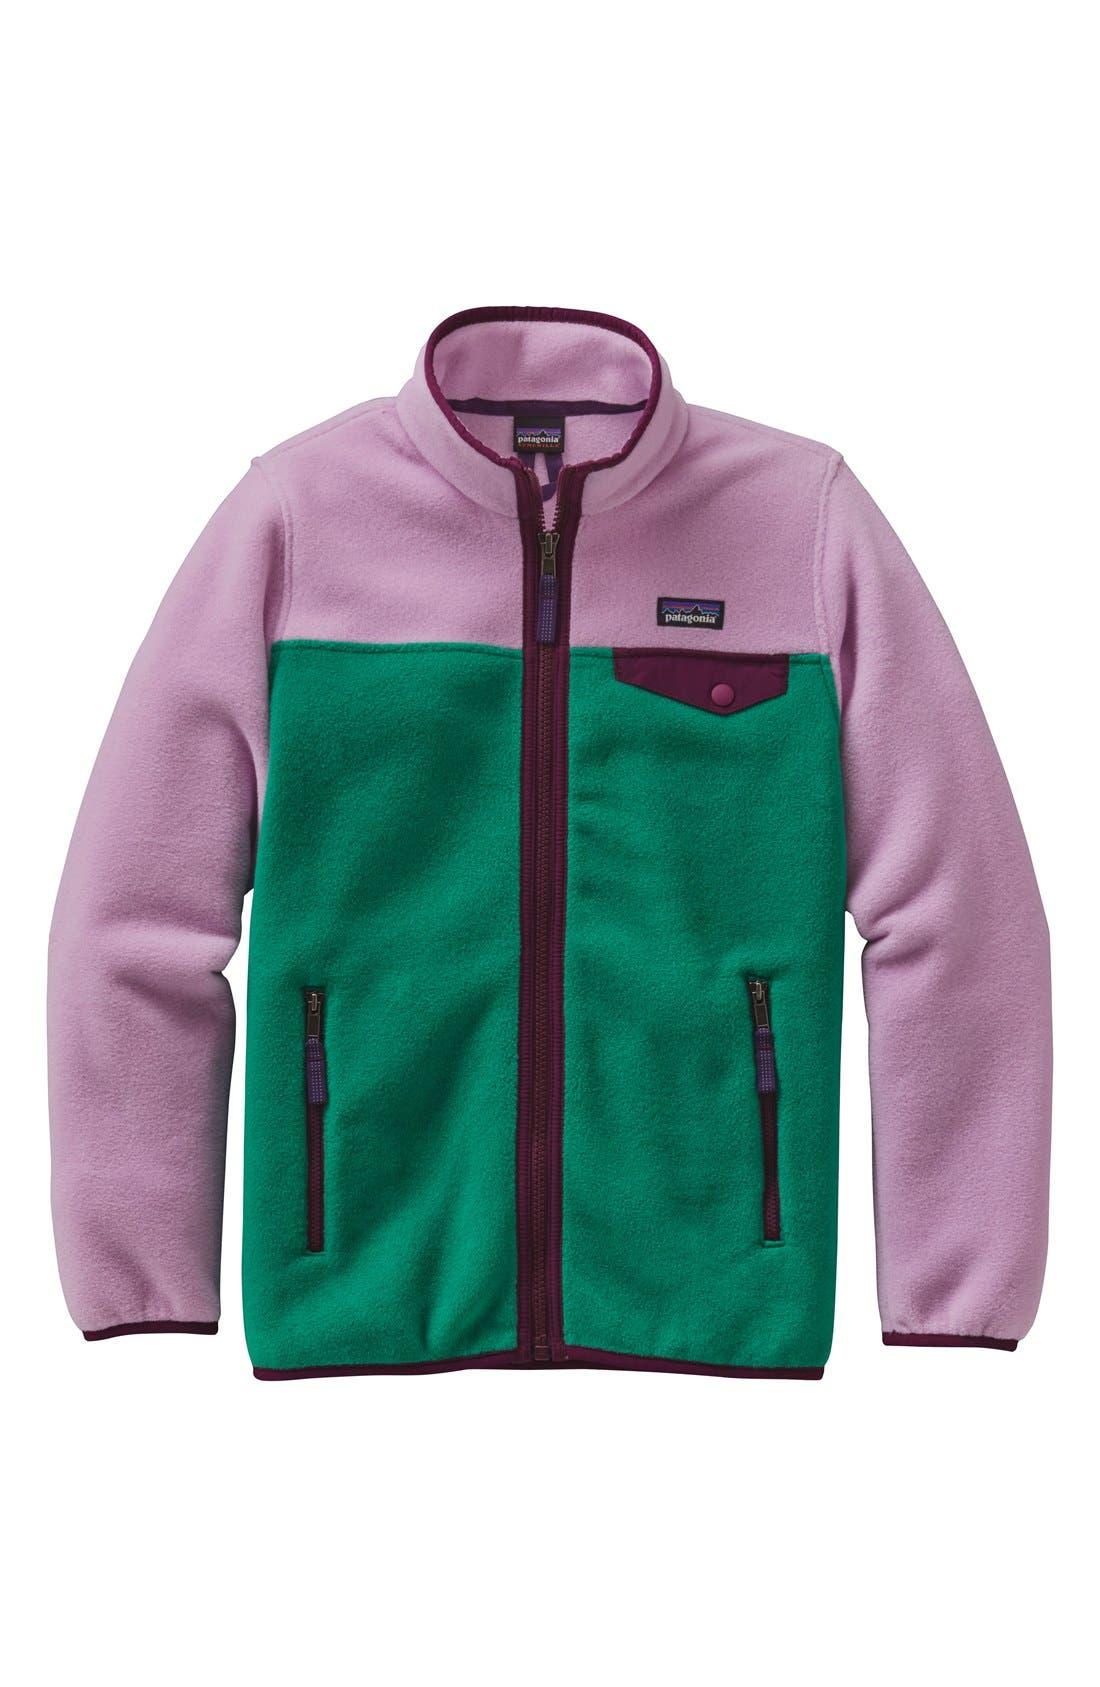 Synchilla<sup>®</sup> Snap-T<sup>®</sup> Fleece Jacket,                             Main thumbnail 5, color,